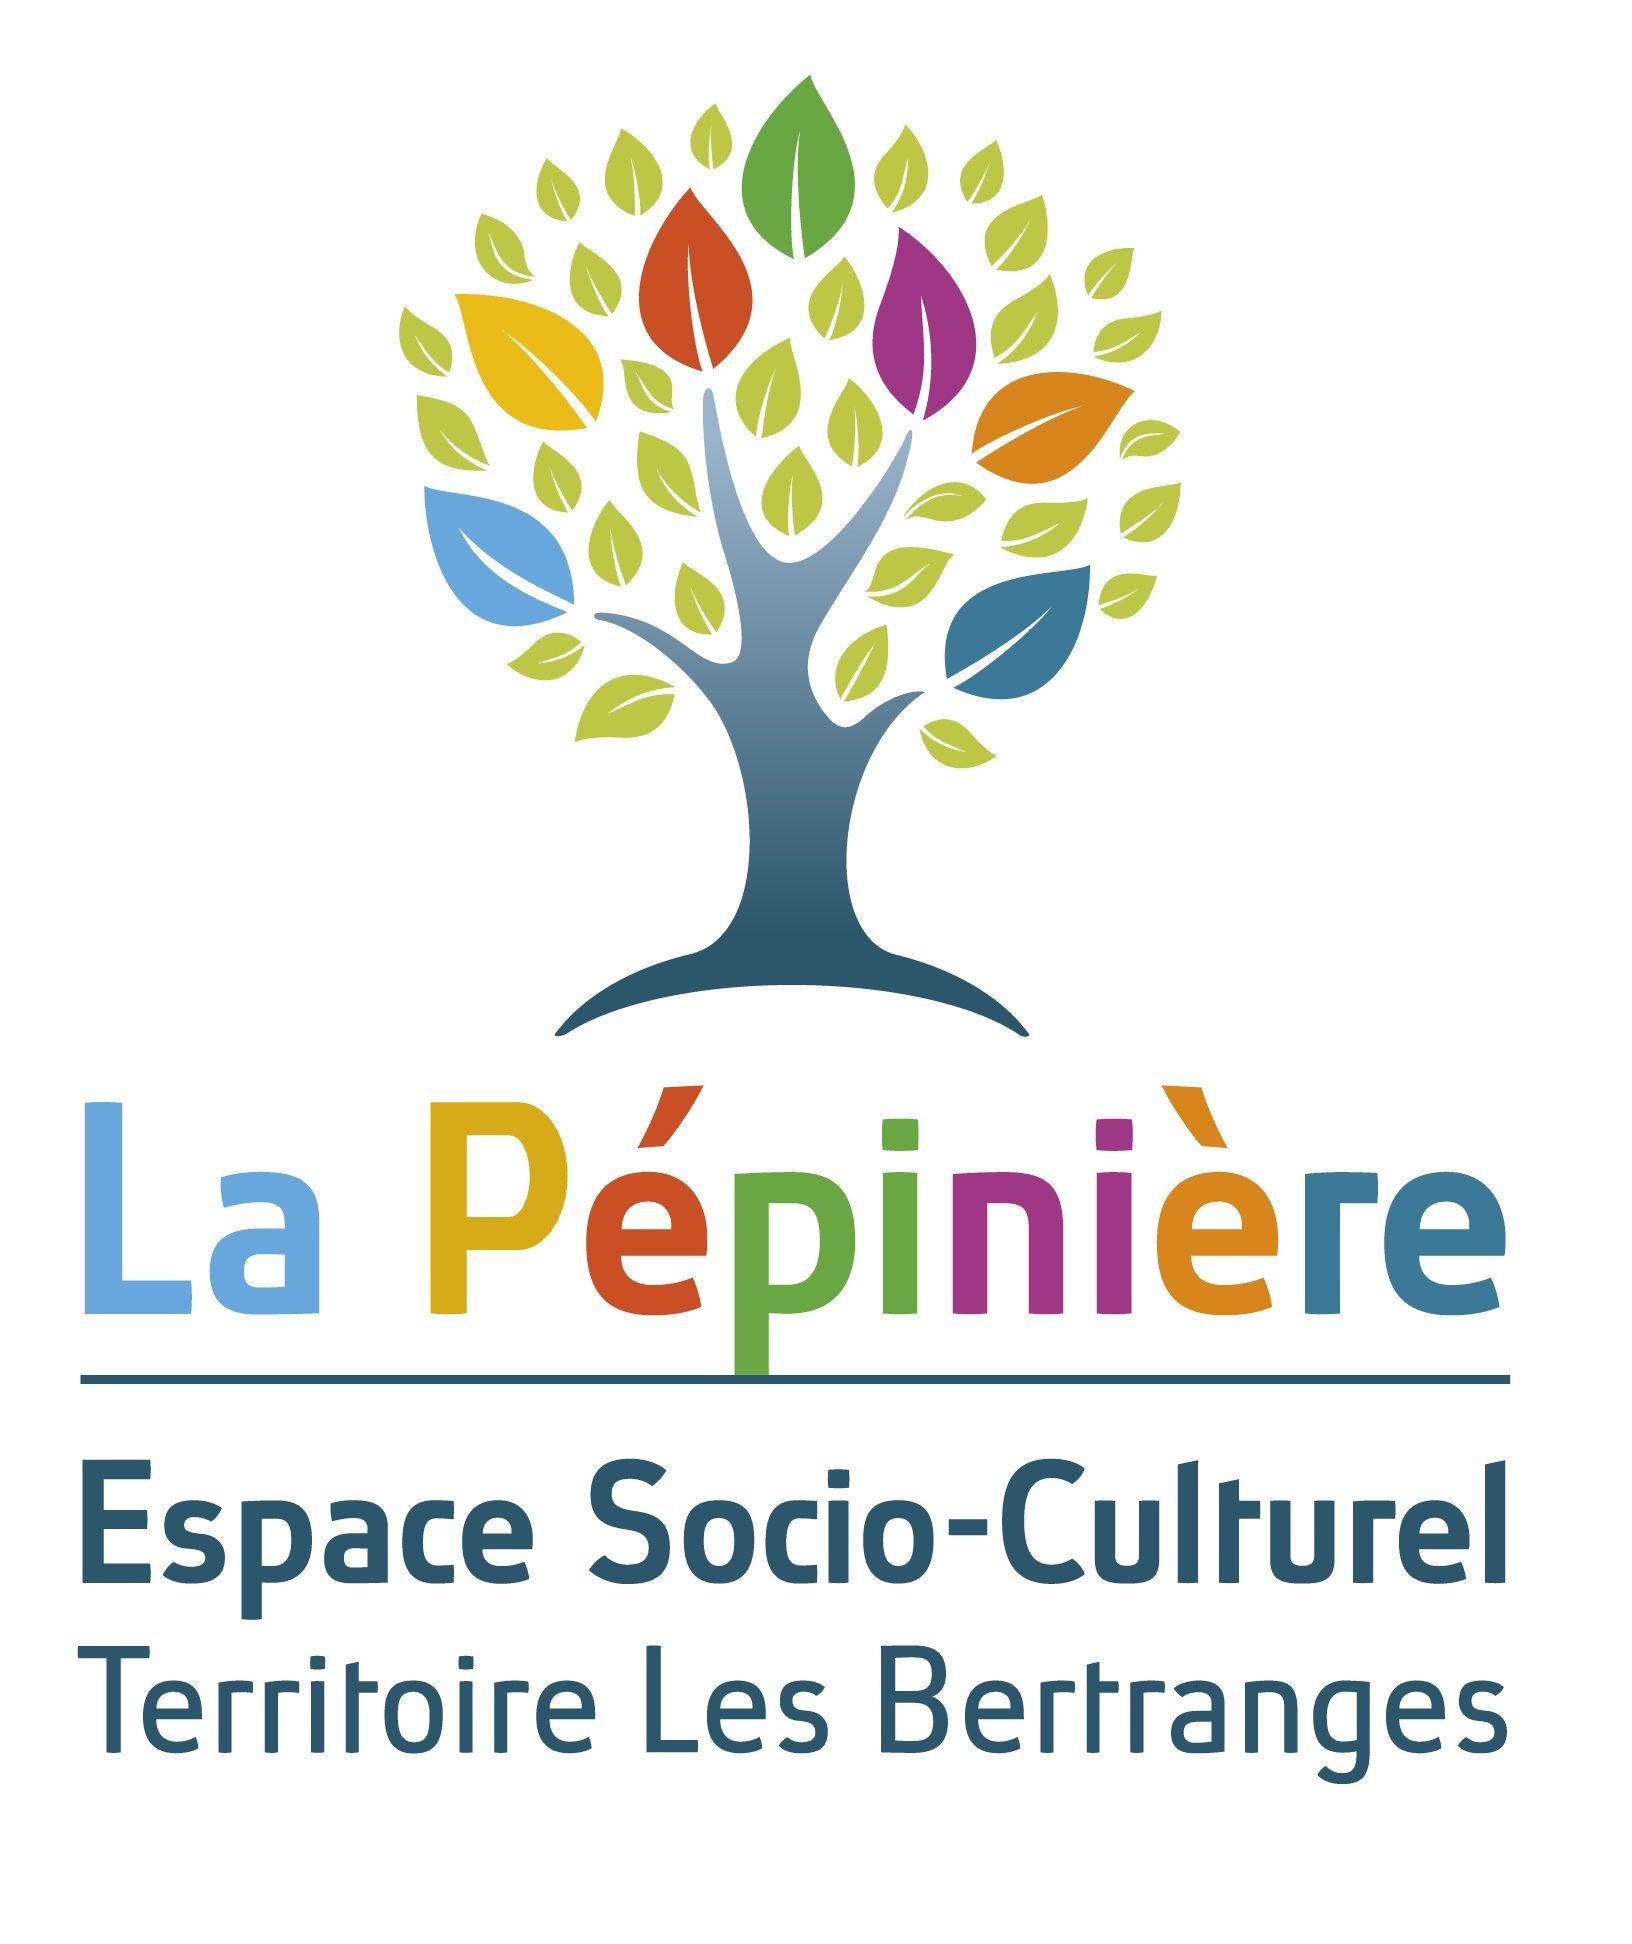 La Pépinière Espace Socio-Culturel